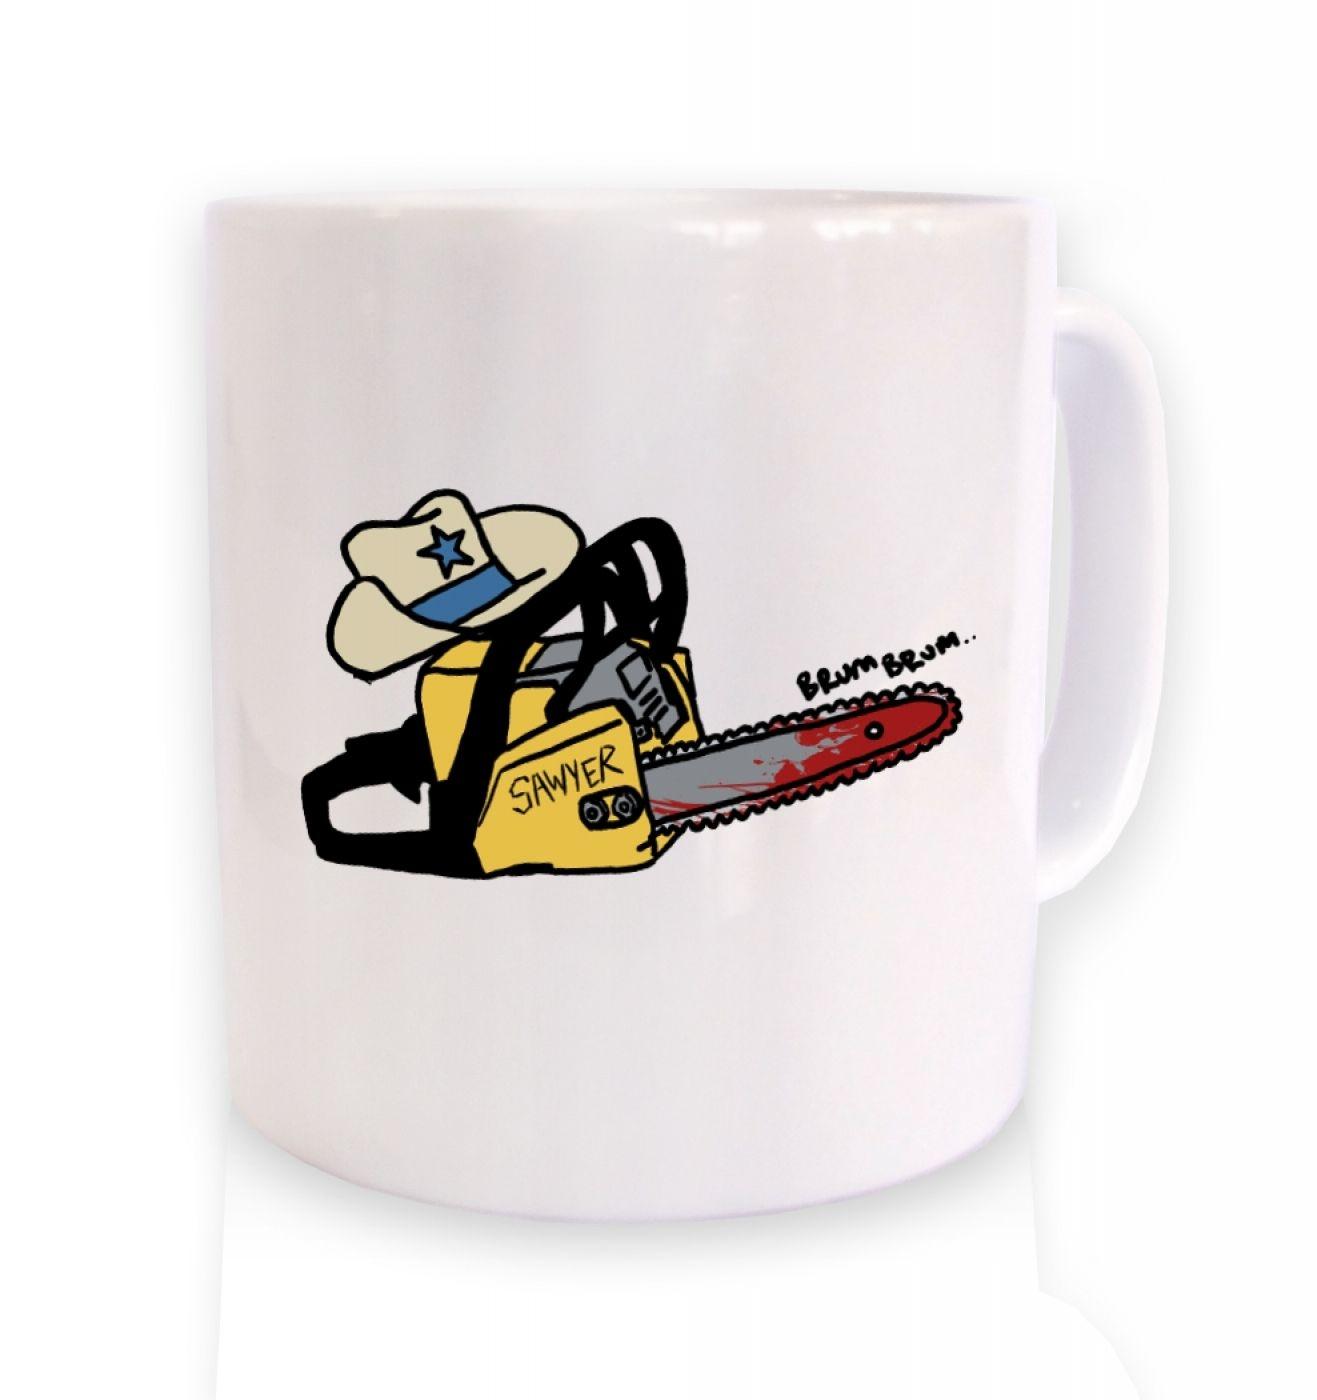 Texas Chainsawyer coffee mug